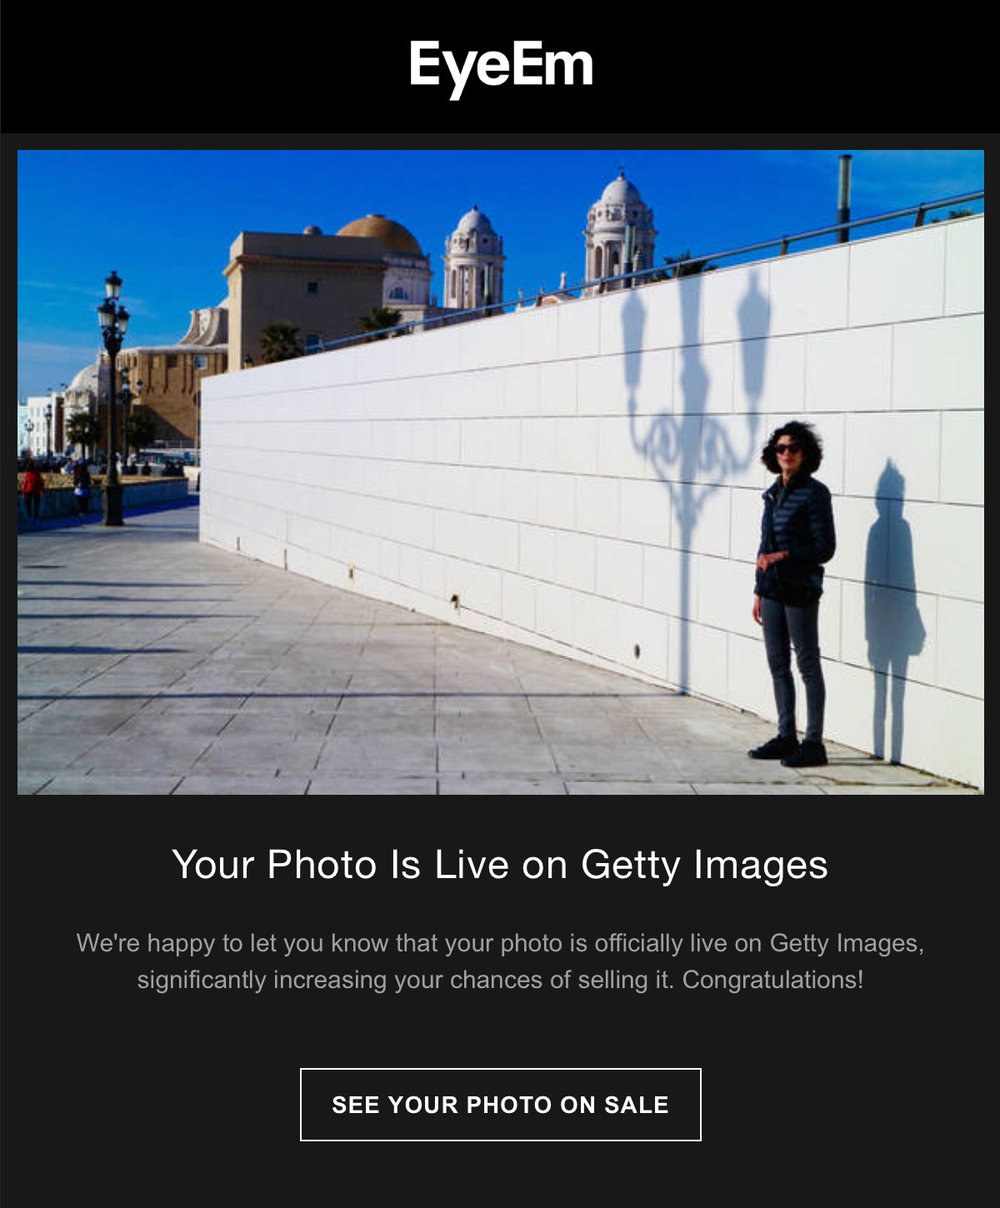 EyEM_YourPhotosLifeOnGettyImagres_.PortraitOfWomanStandingAgainstWallIn City.jpg